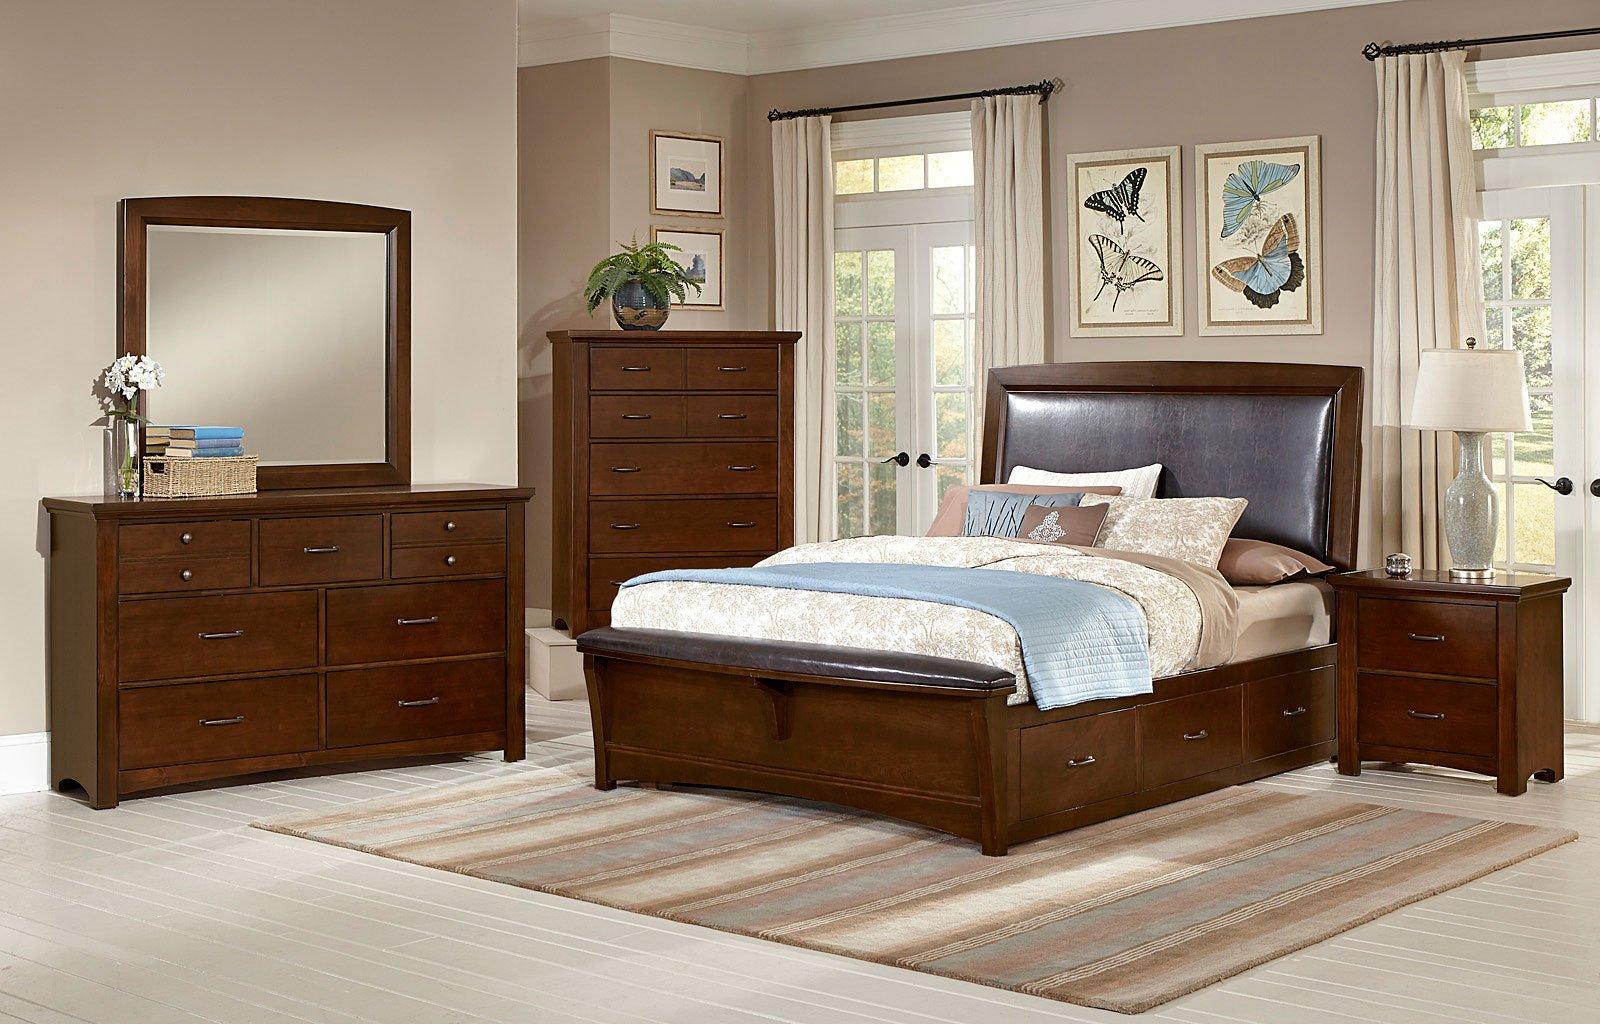 Transitions Upholstered Bedroom Set w/ One Storage (Dark Cherry)